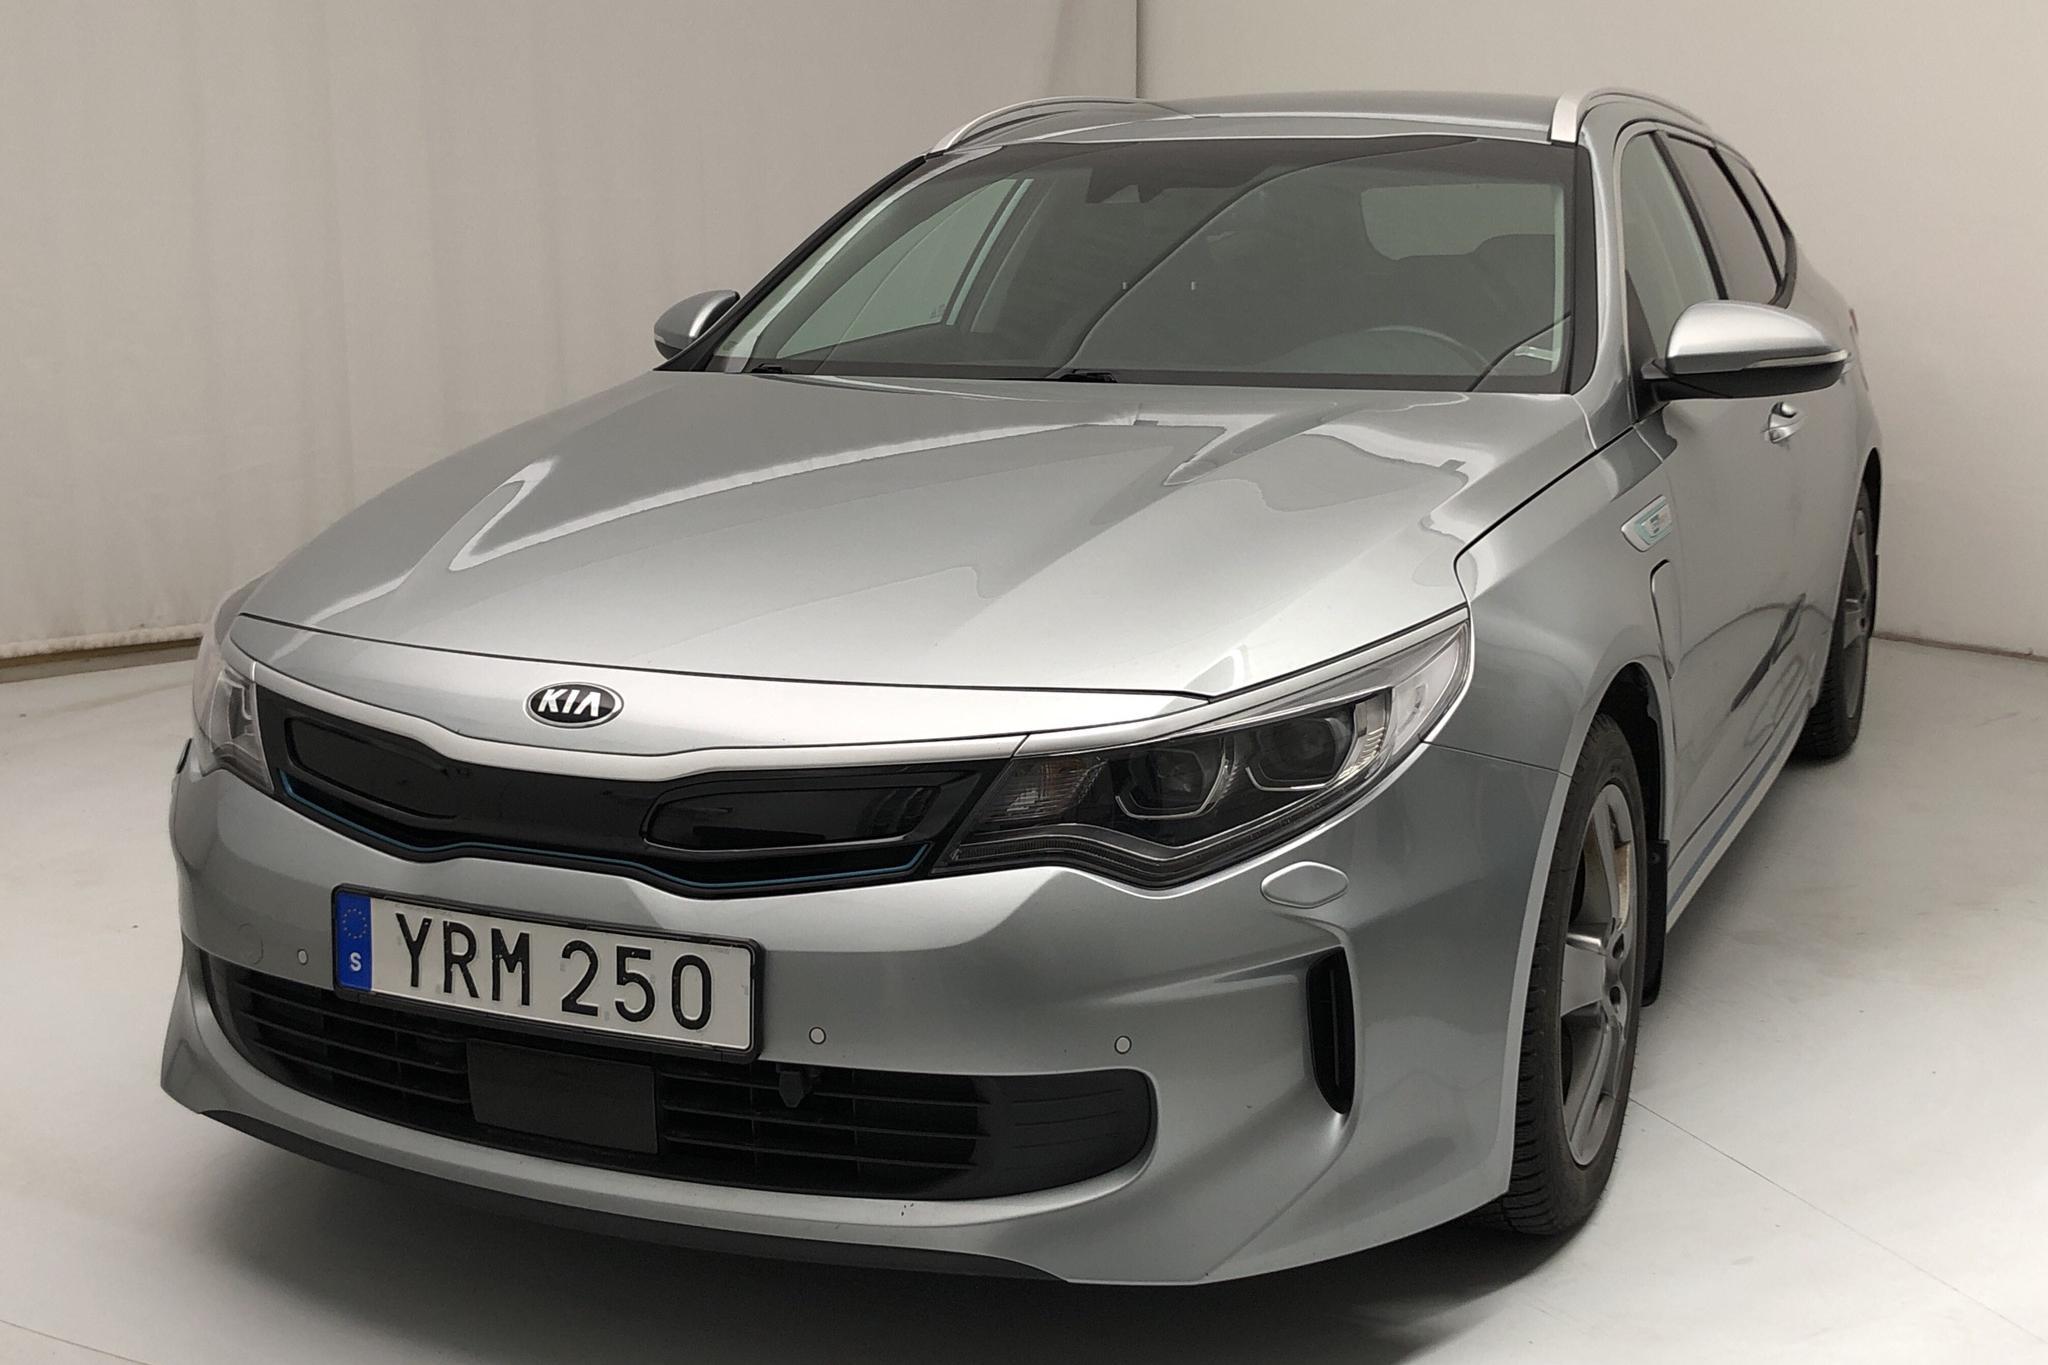 KIA Optima 2.0 GDi Plug-in Hybrid SW (205hk) - 111 990 km - Automatic - gray - 2018